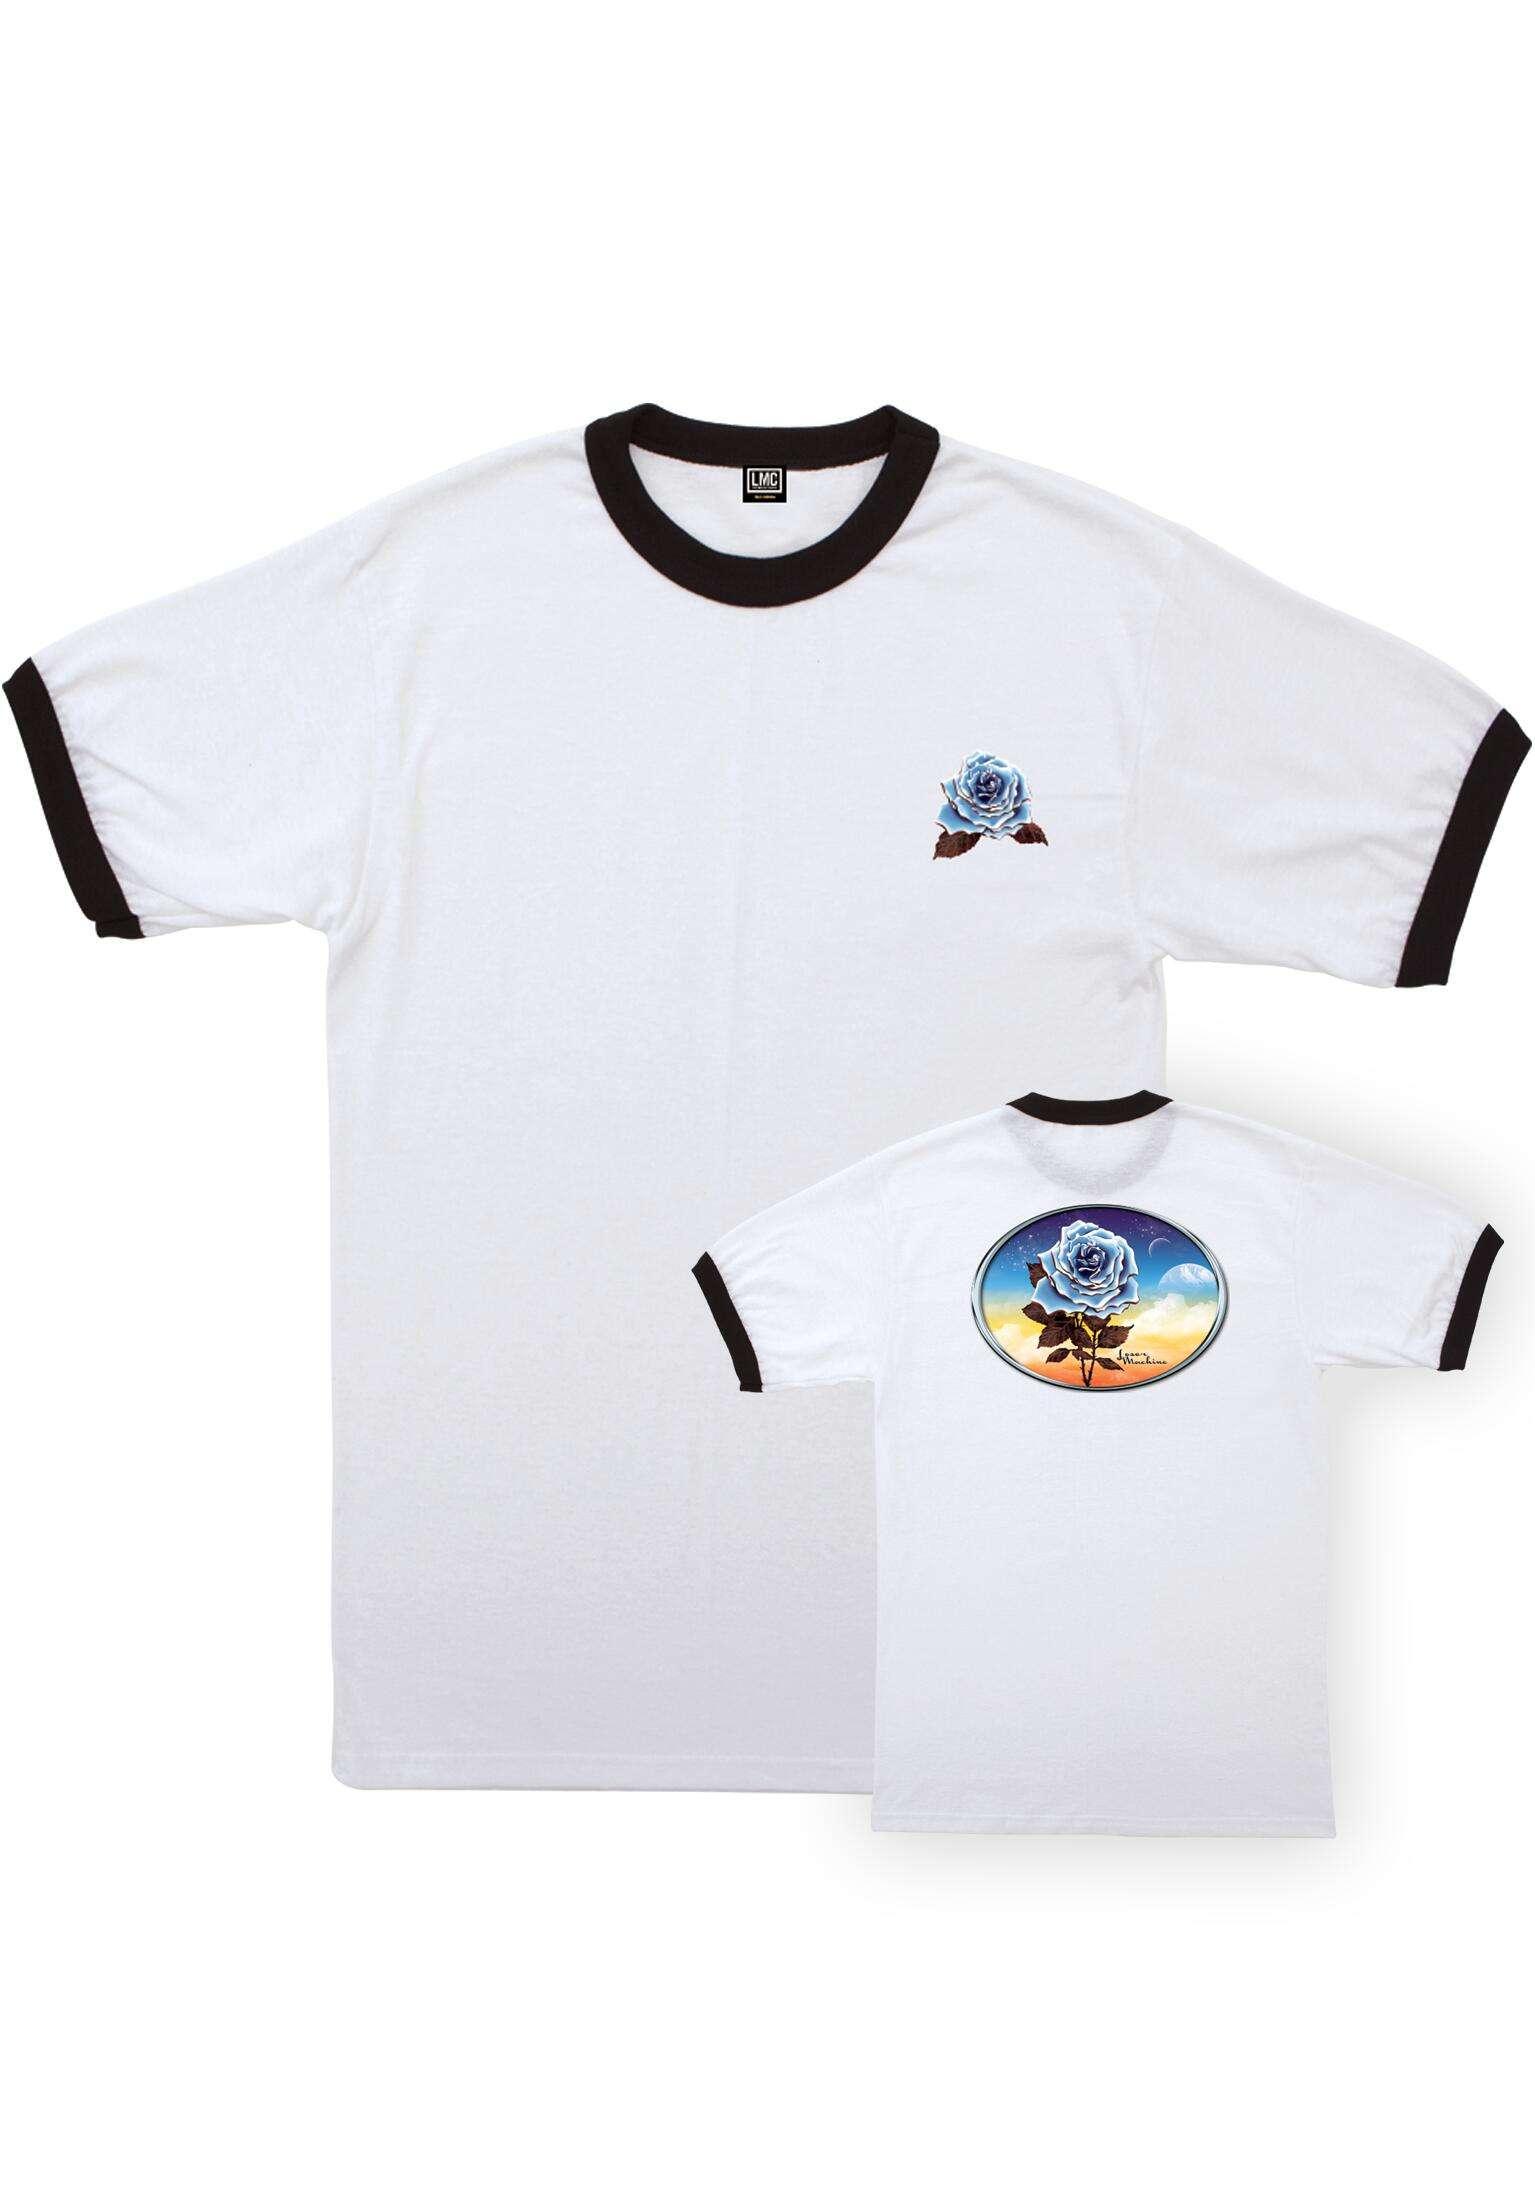 61b488af5607 Chrome Rose Ringer Loser-Machine T-Shirts in white-black for Men | Titus